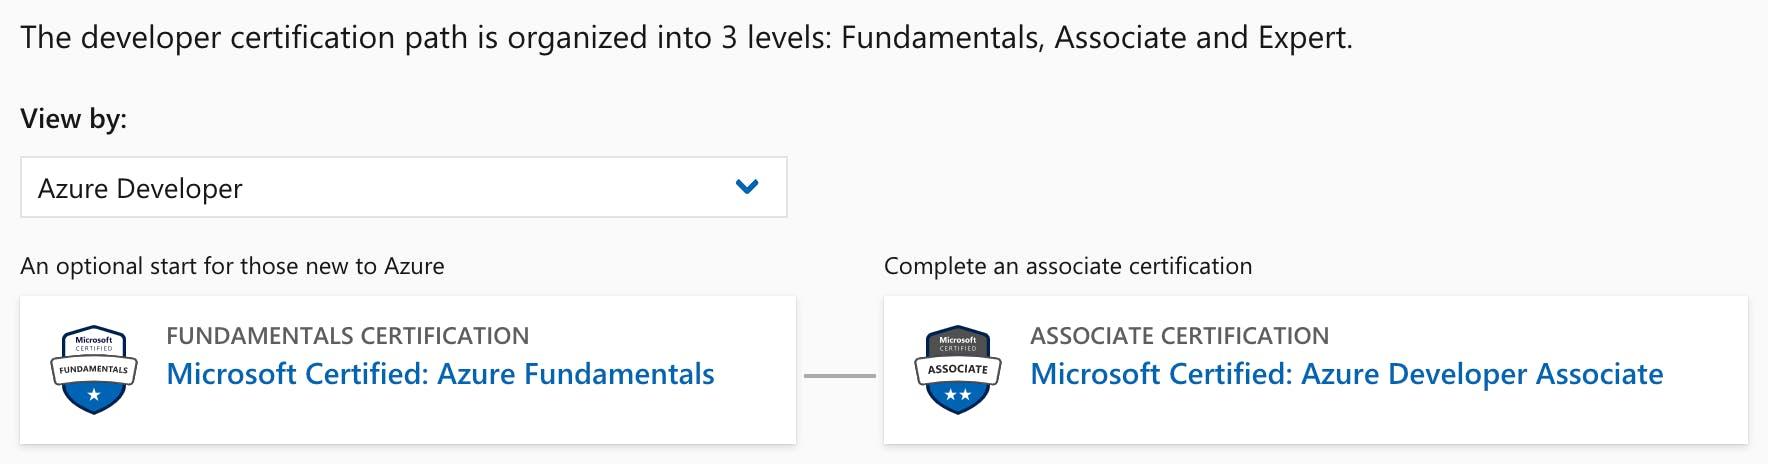 Developer certification path